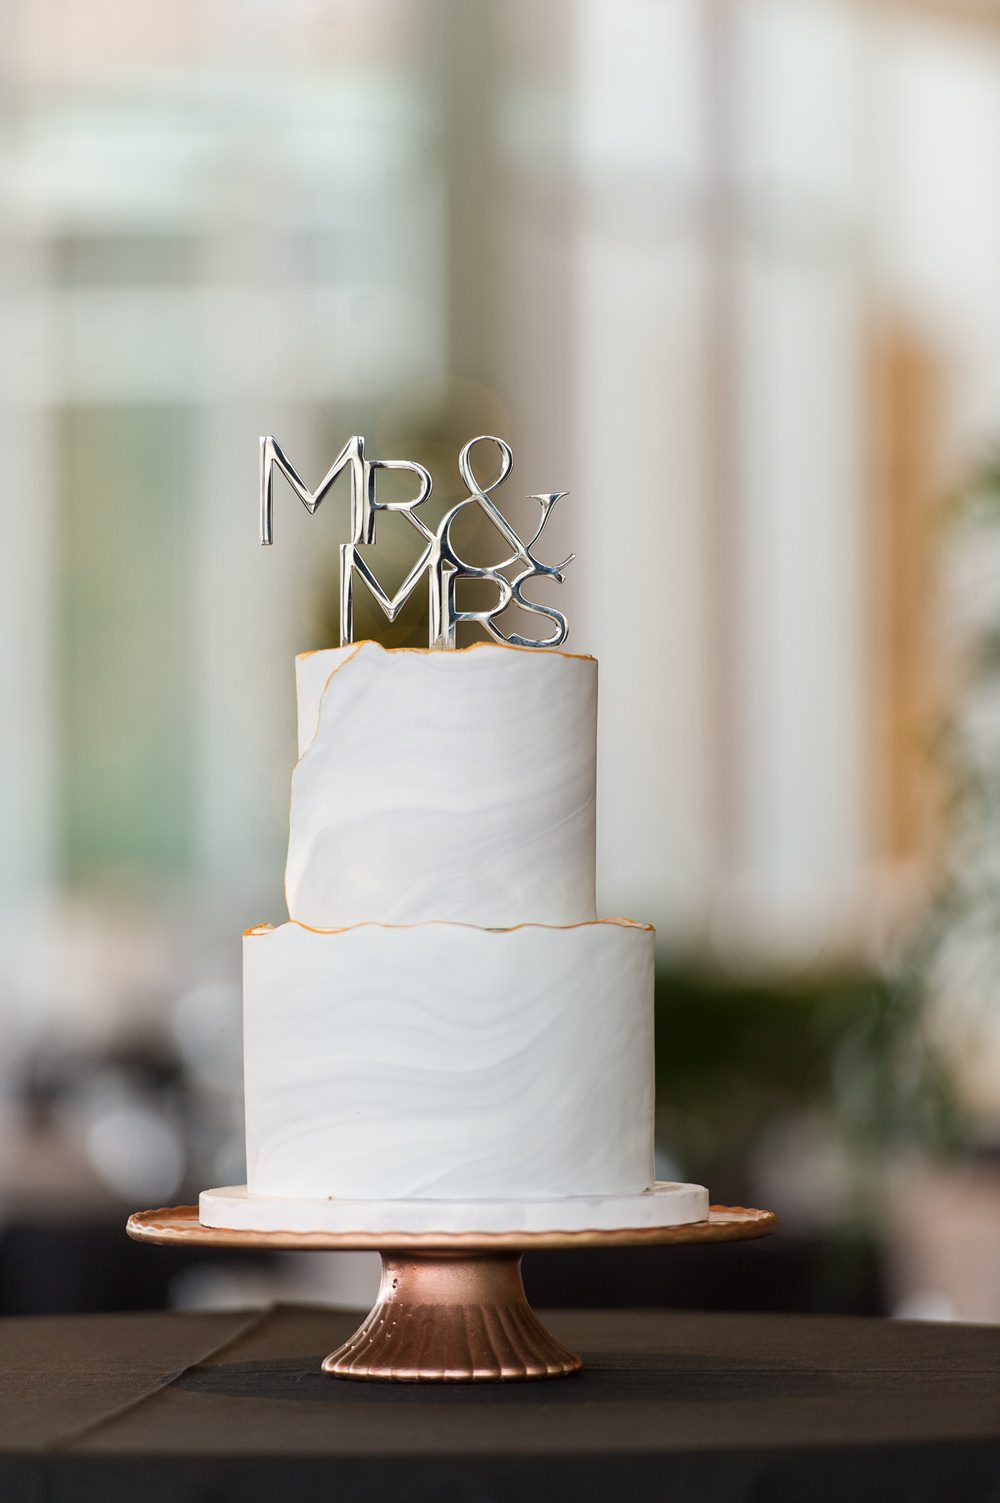 Buttercream Cake Mr Mrs Topper Greenhouse Michigan Wedding Jean Smith Photography